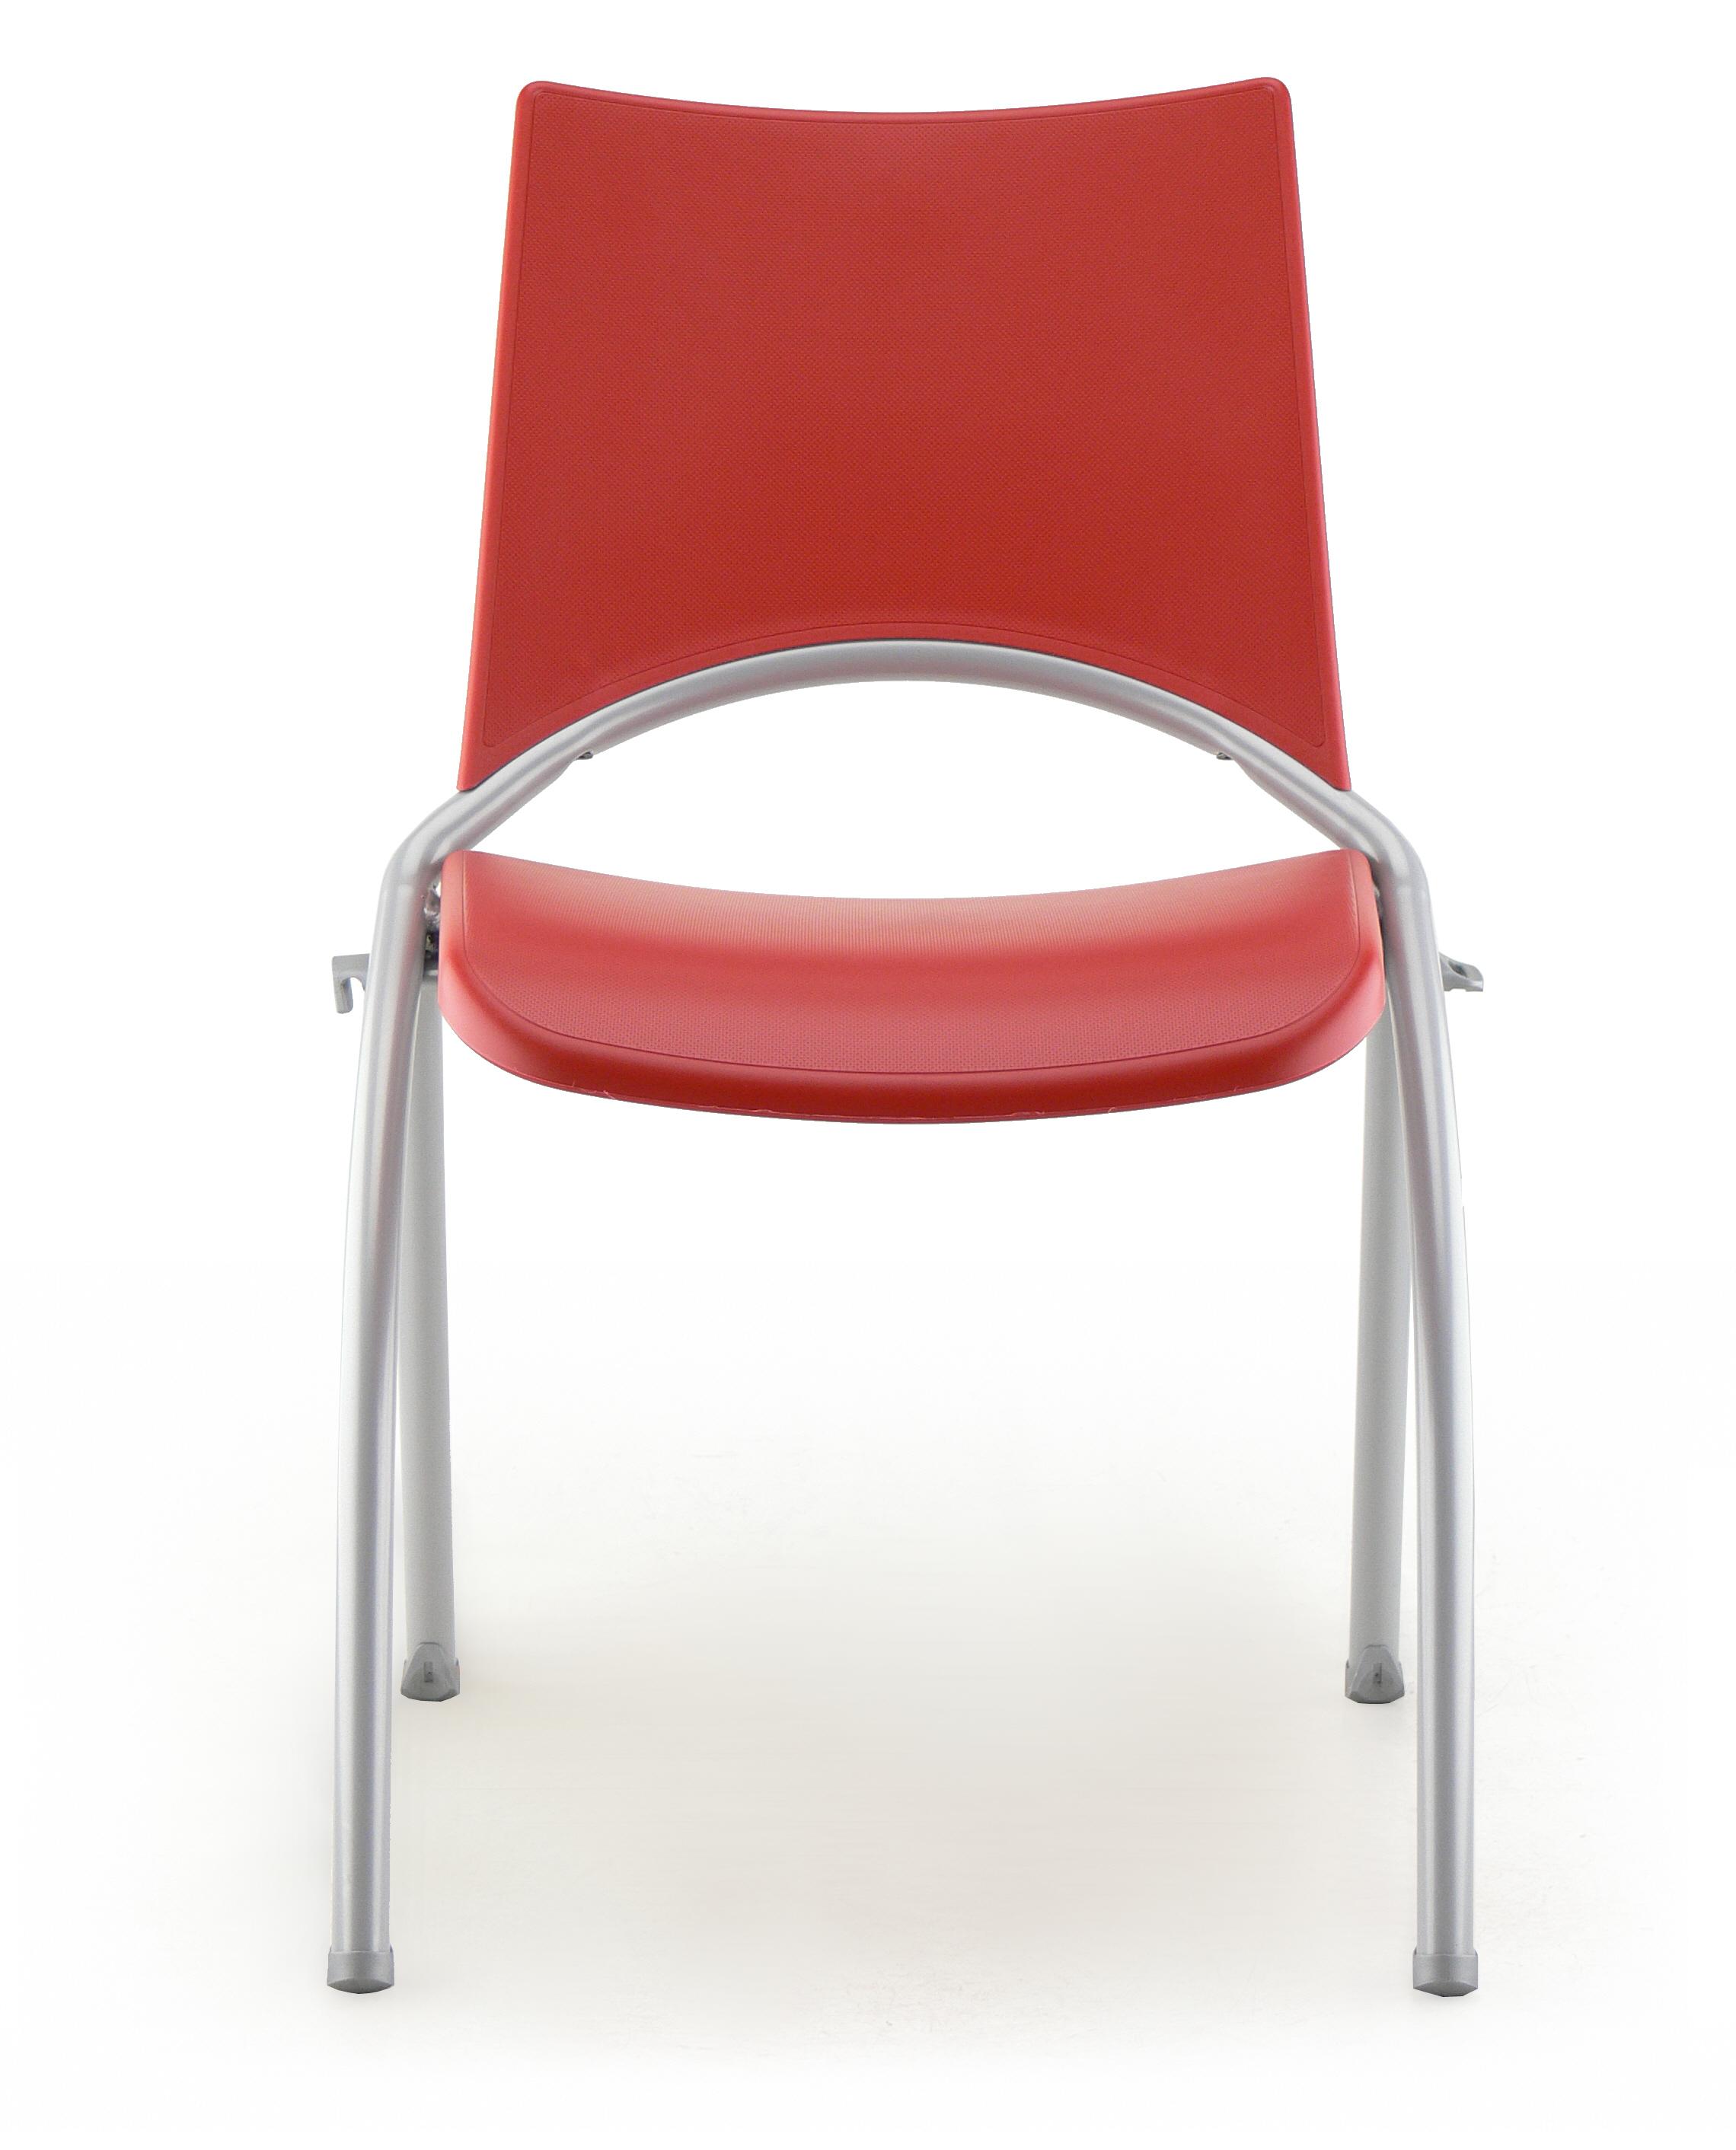 Chaise WAP - assise et dossier en polypropylène